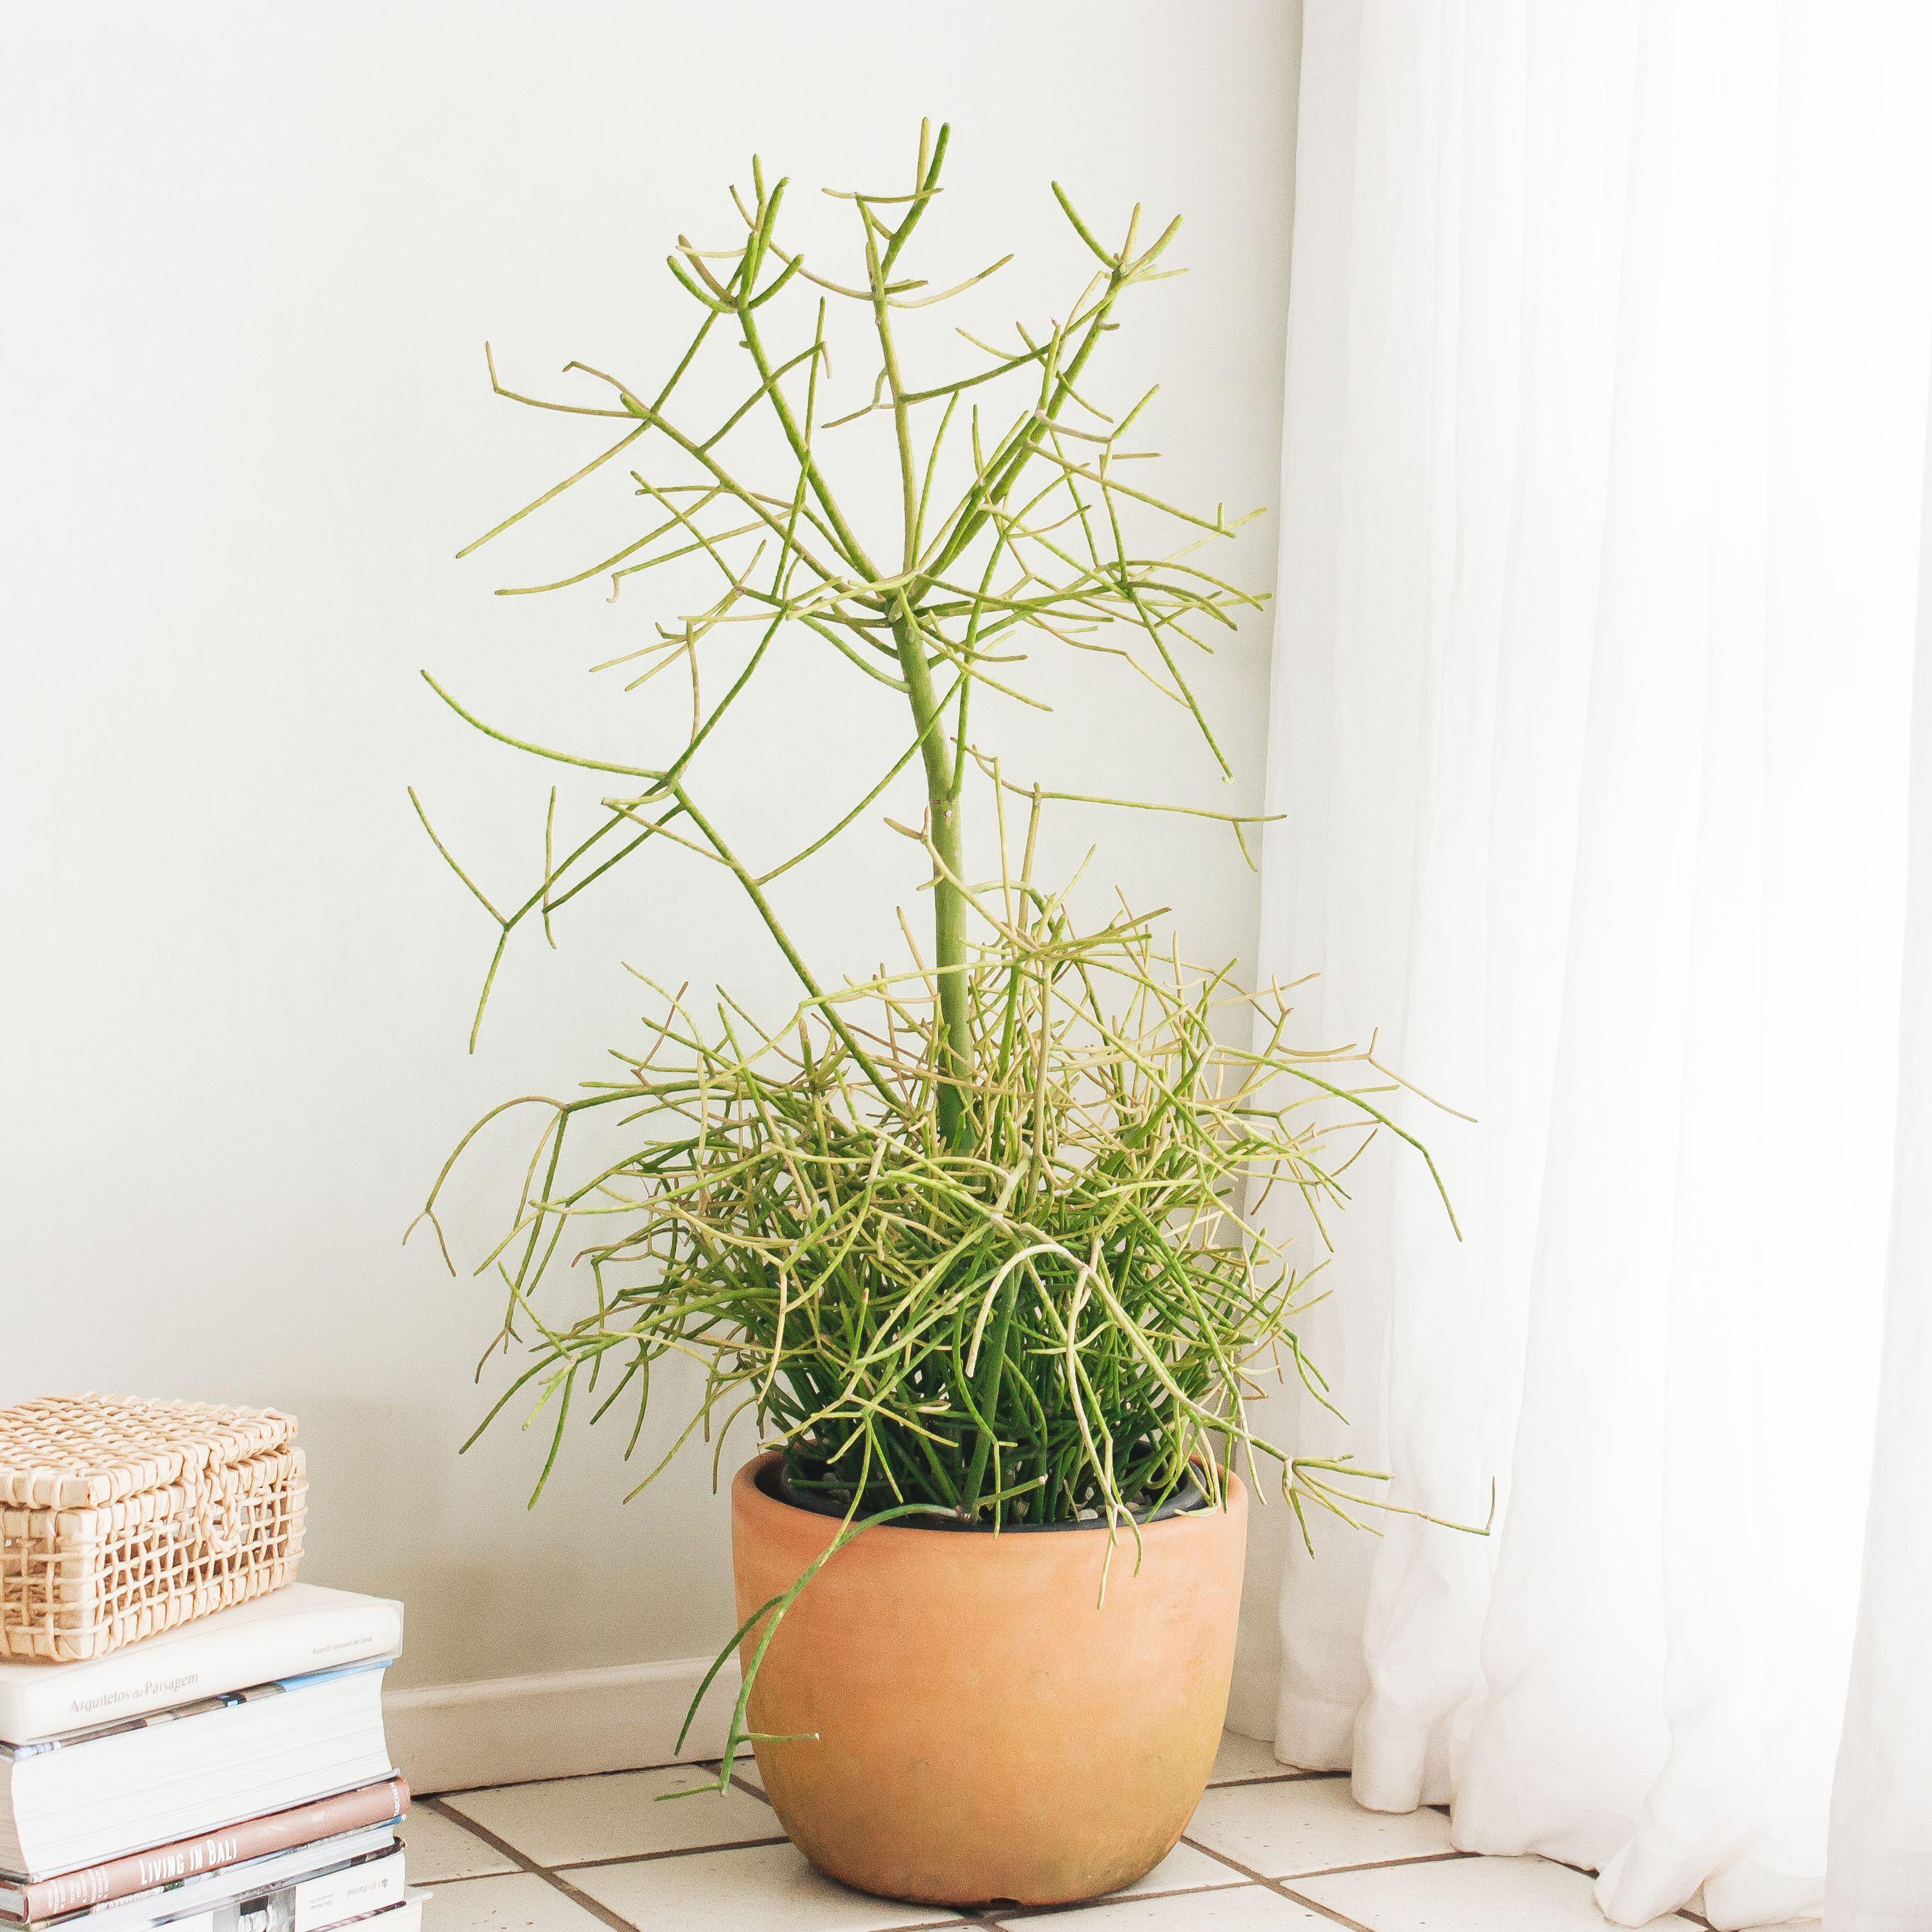 Pencil Cactus Plant Care Growing Guide